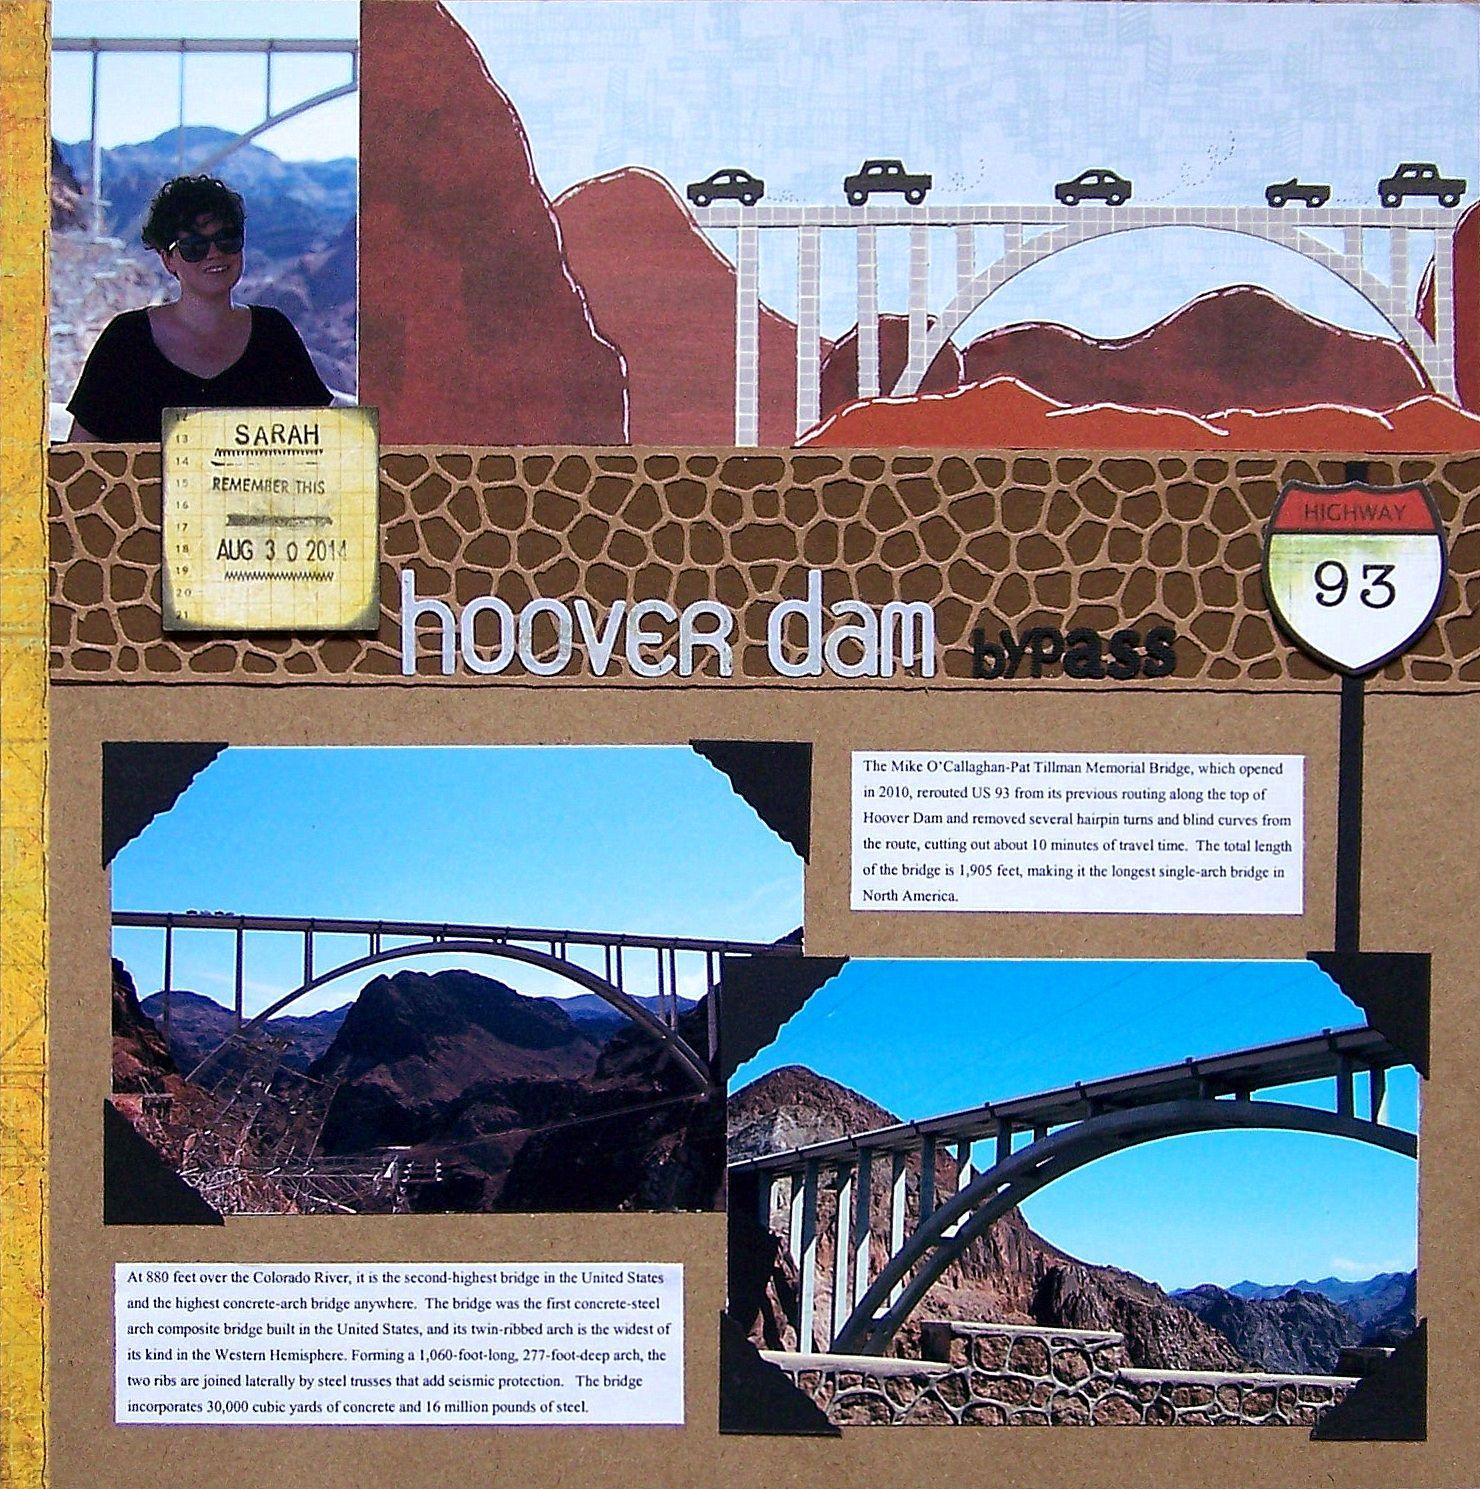 How to scrapbook disney vacation - Hoover Dam Bypass Scrapbook Com Vacation Scrapbookwedding Scrapbookdisney